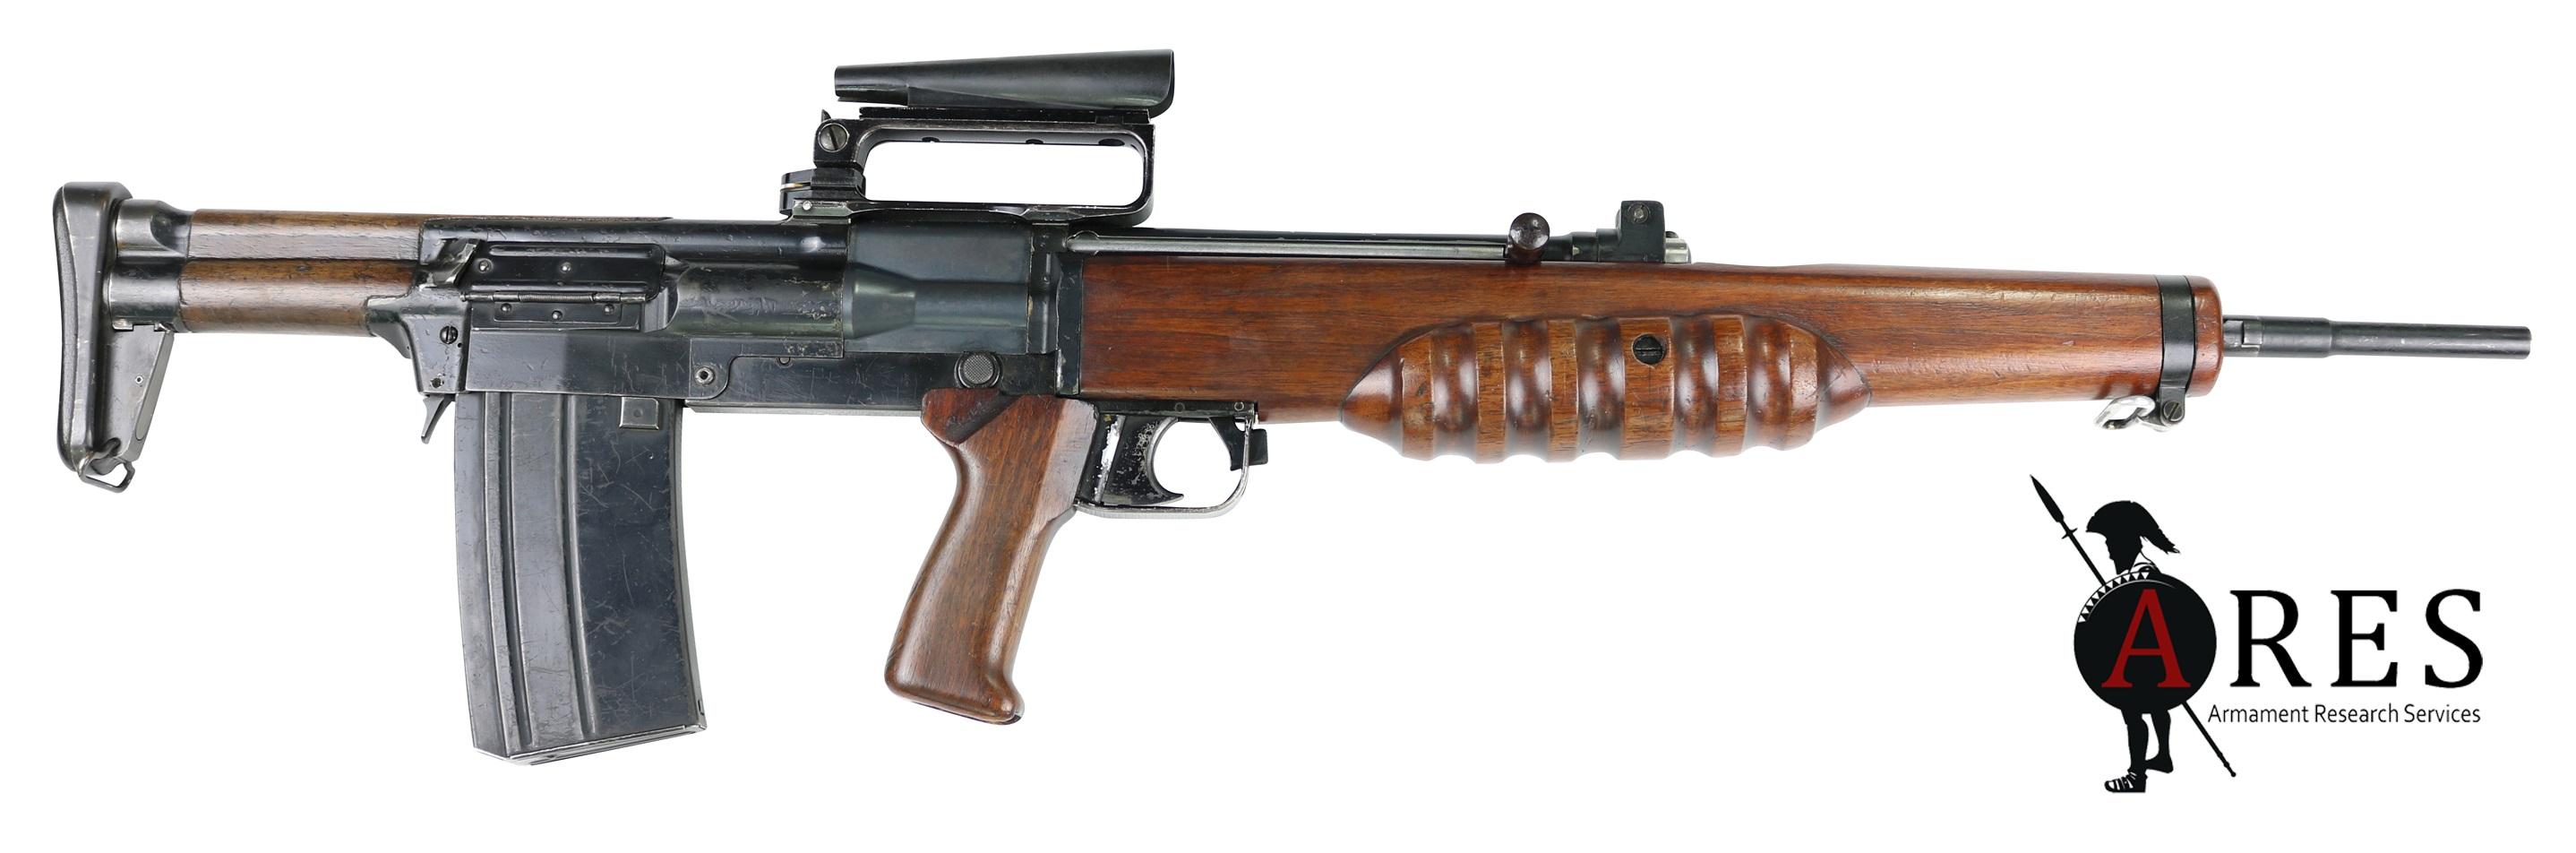 British Janson E M 2 automatic rifle – Armament Research